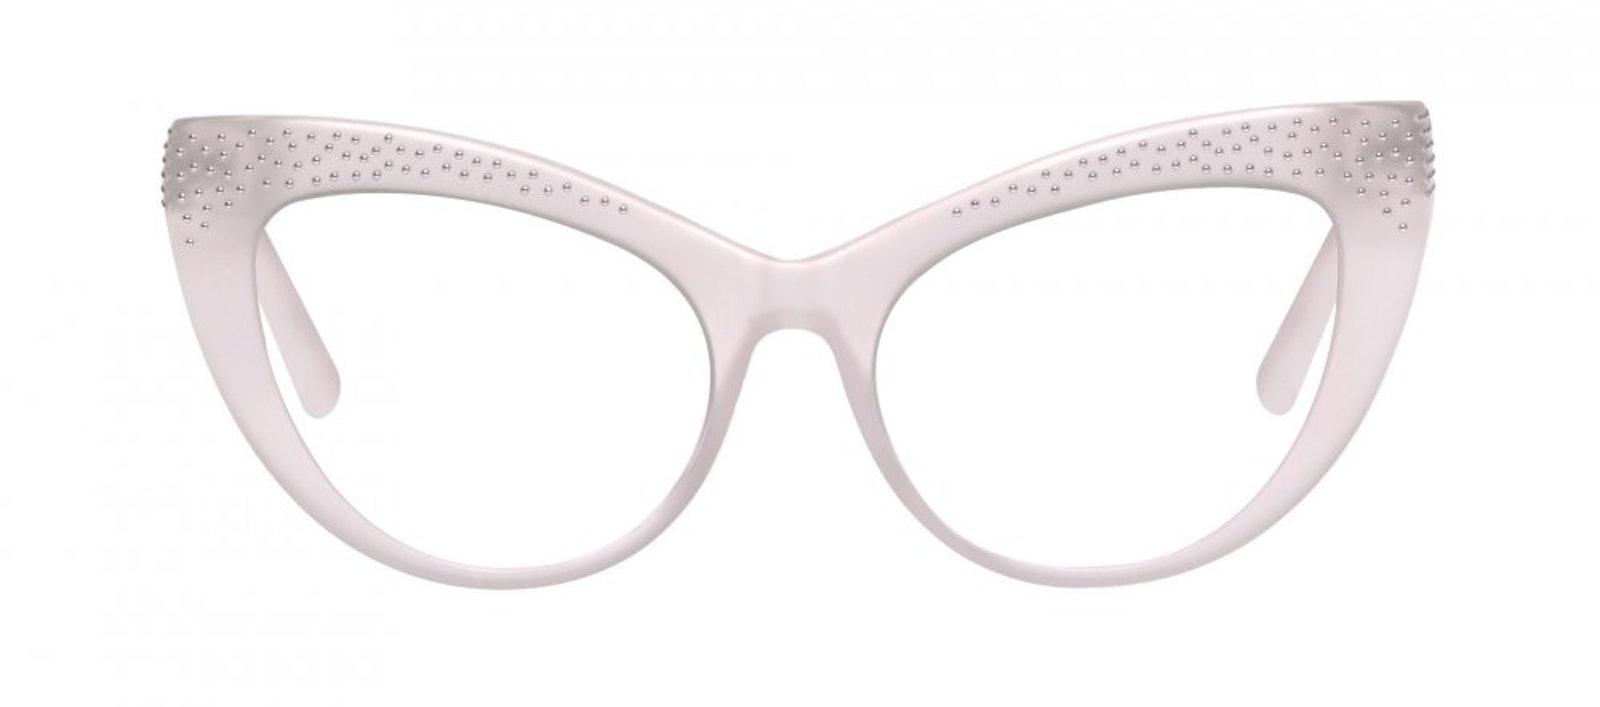 b2abe7ee2d5 Keiko. Previous. Affordable Fashion Glasses Cat Eye ...